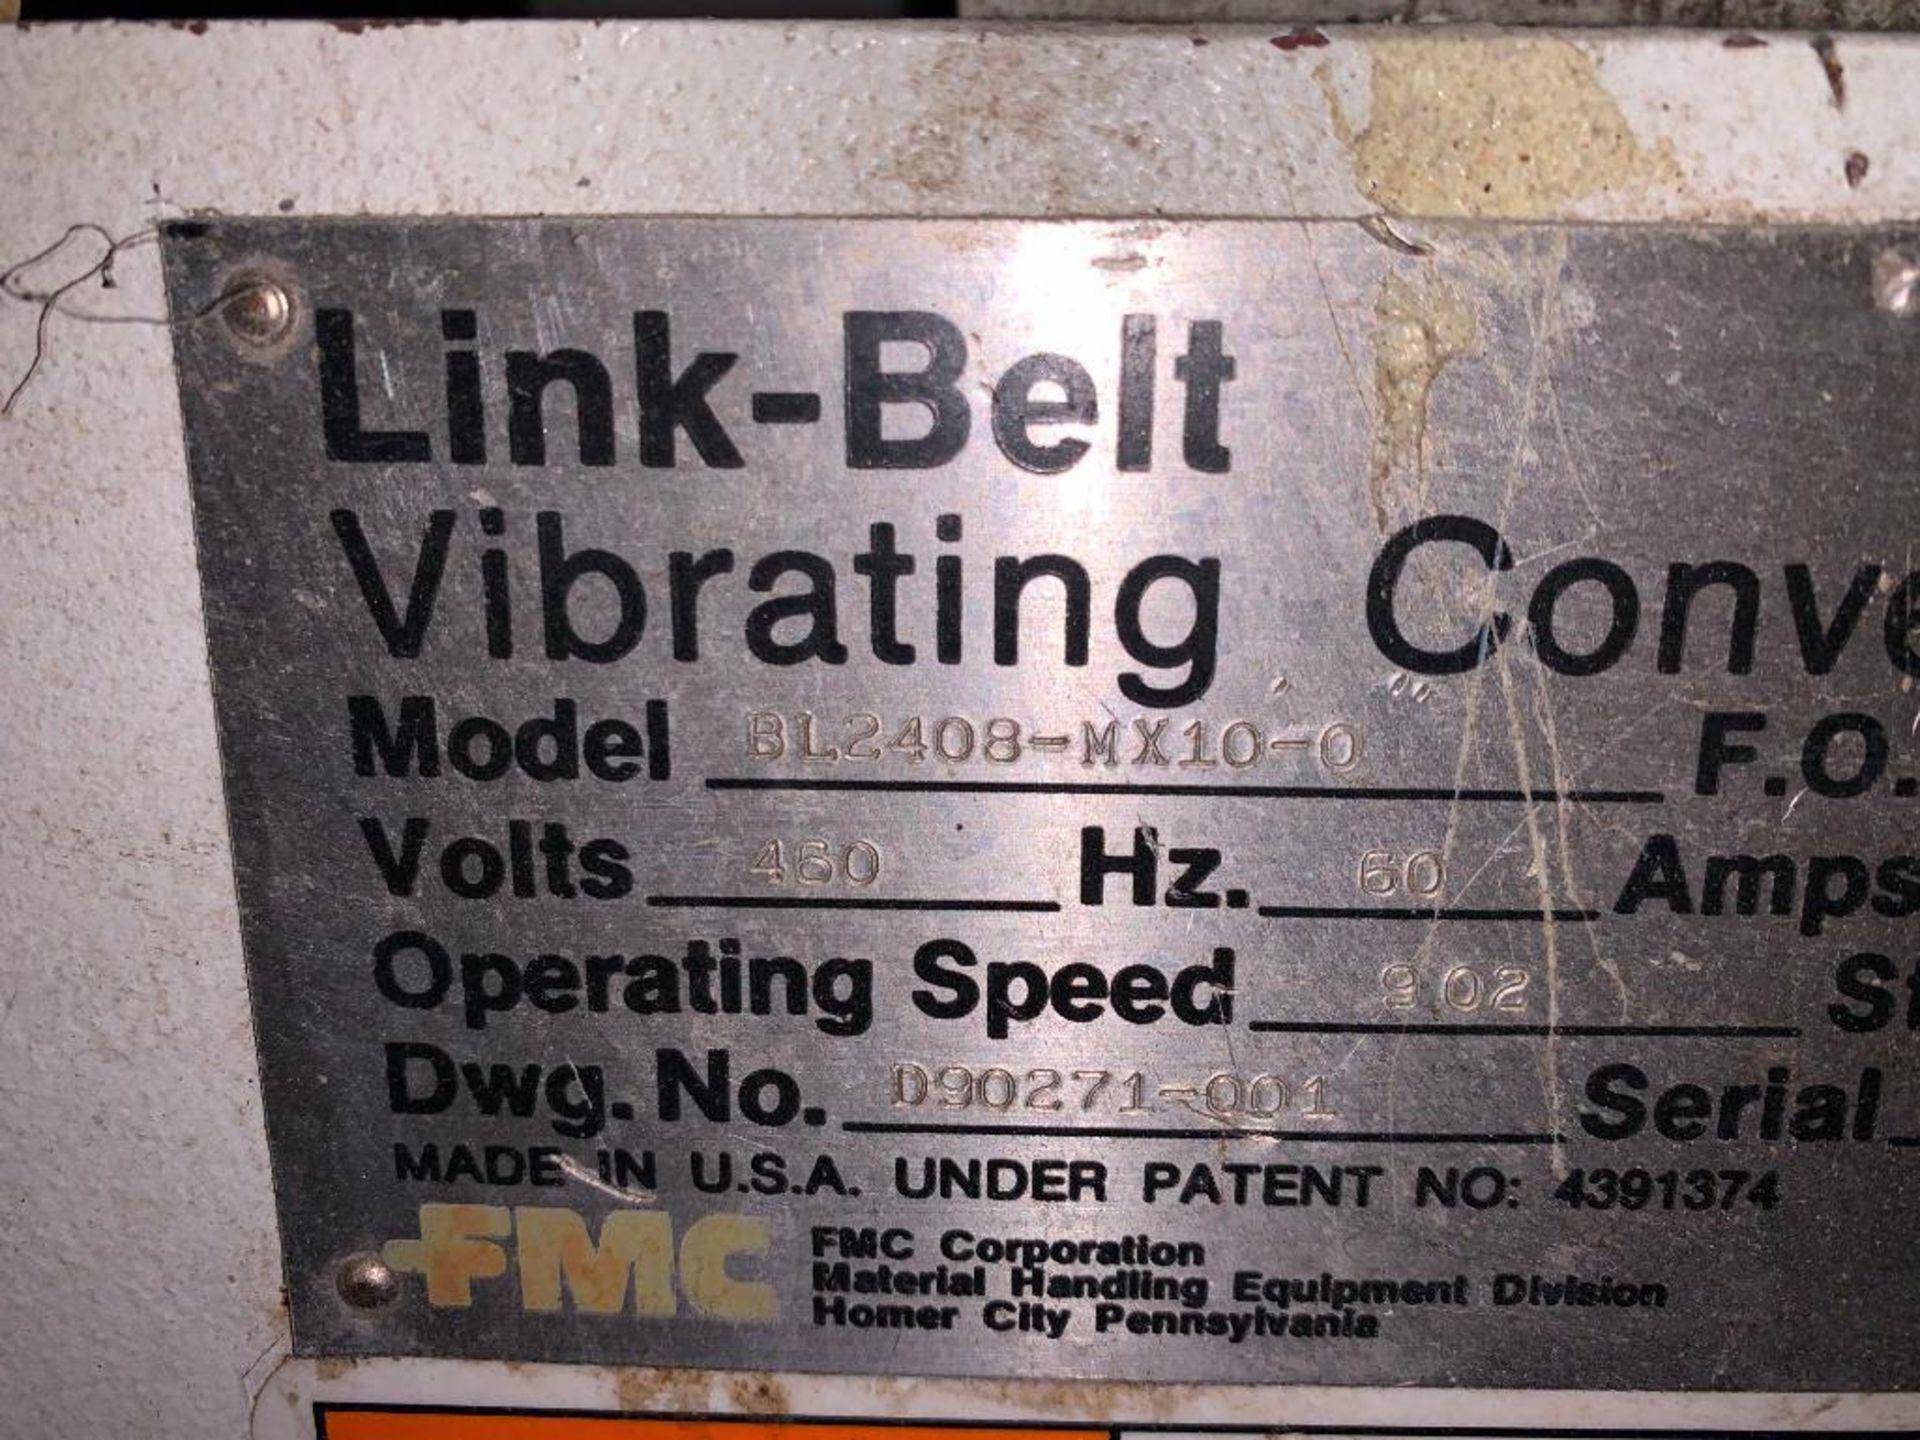 1993 Link-Belt stainless steel vibratory scalping conveyor - Image 3 of 10